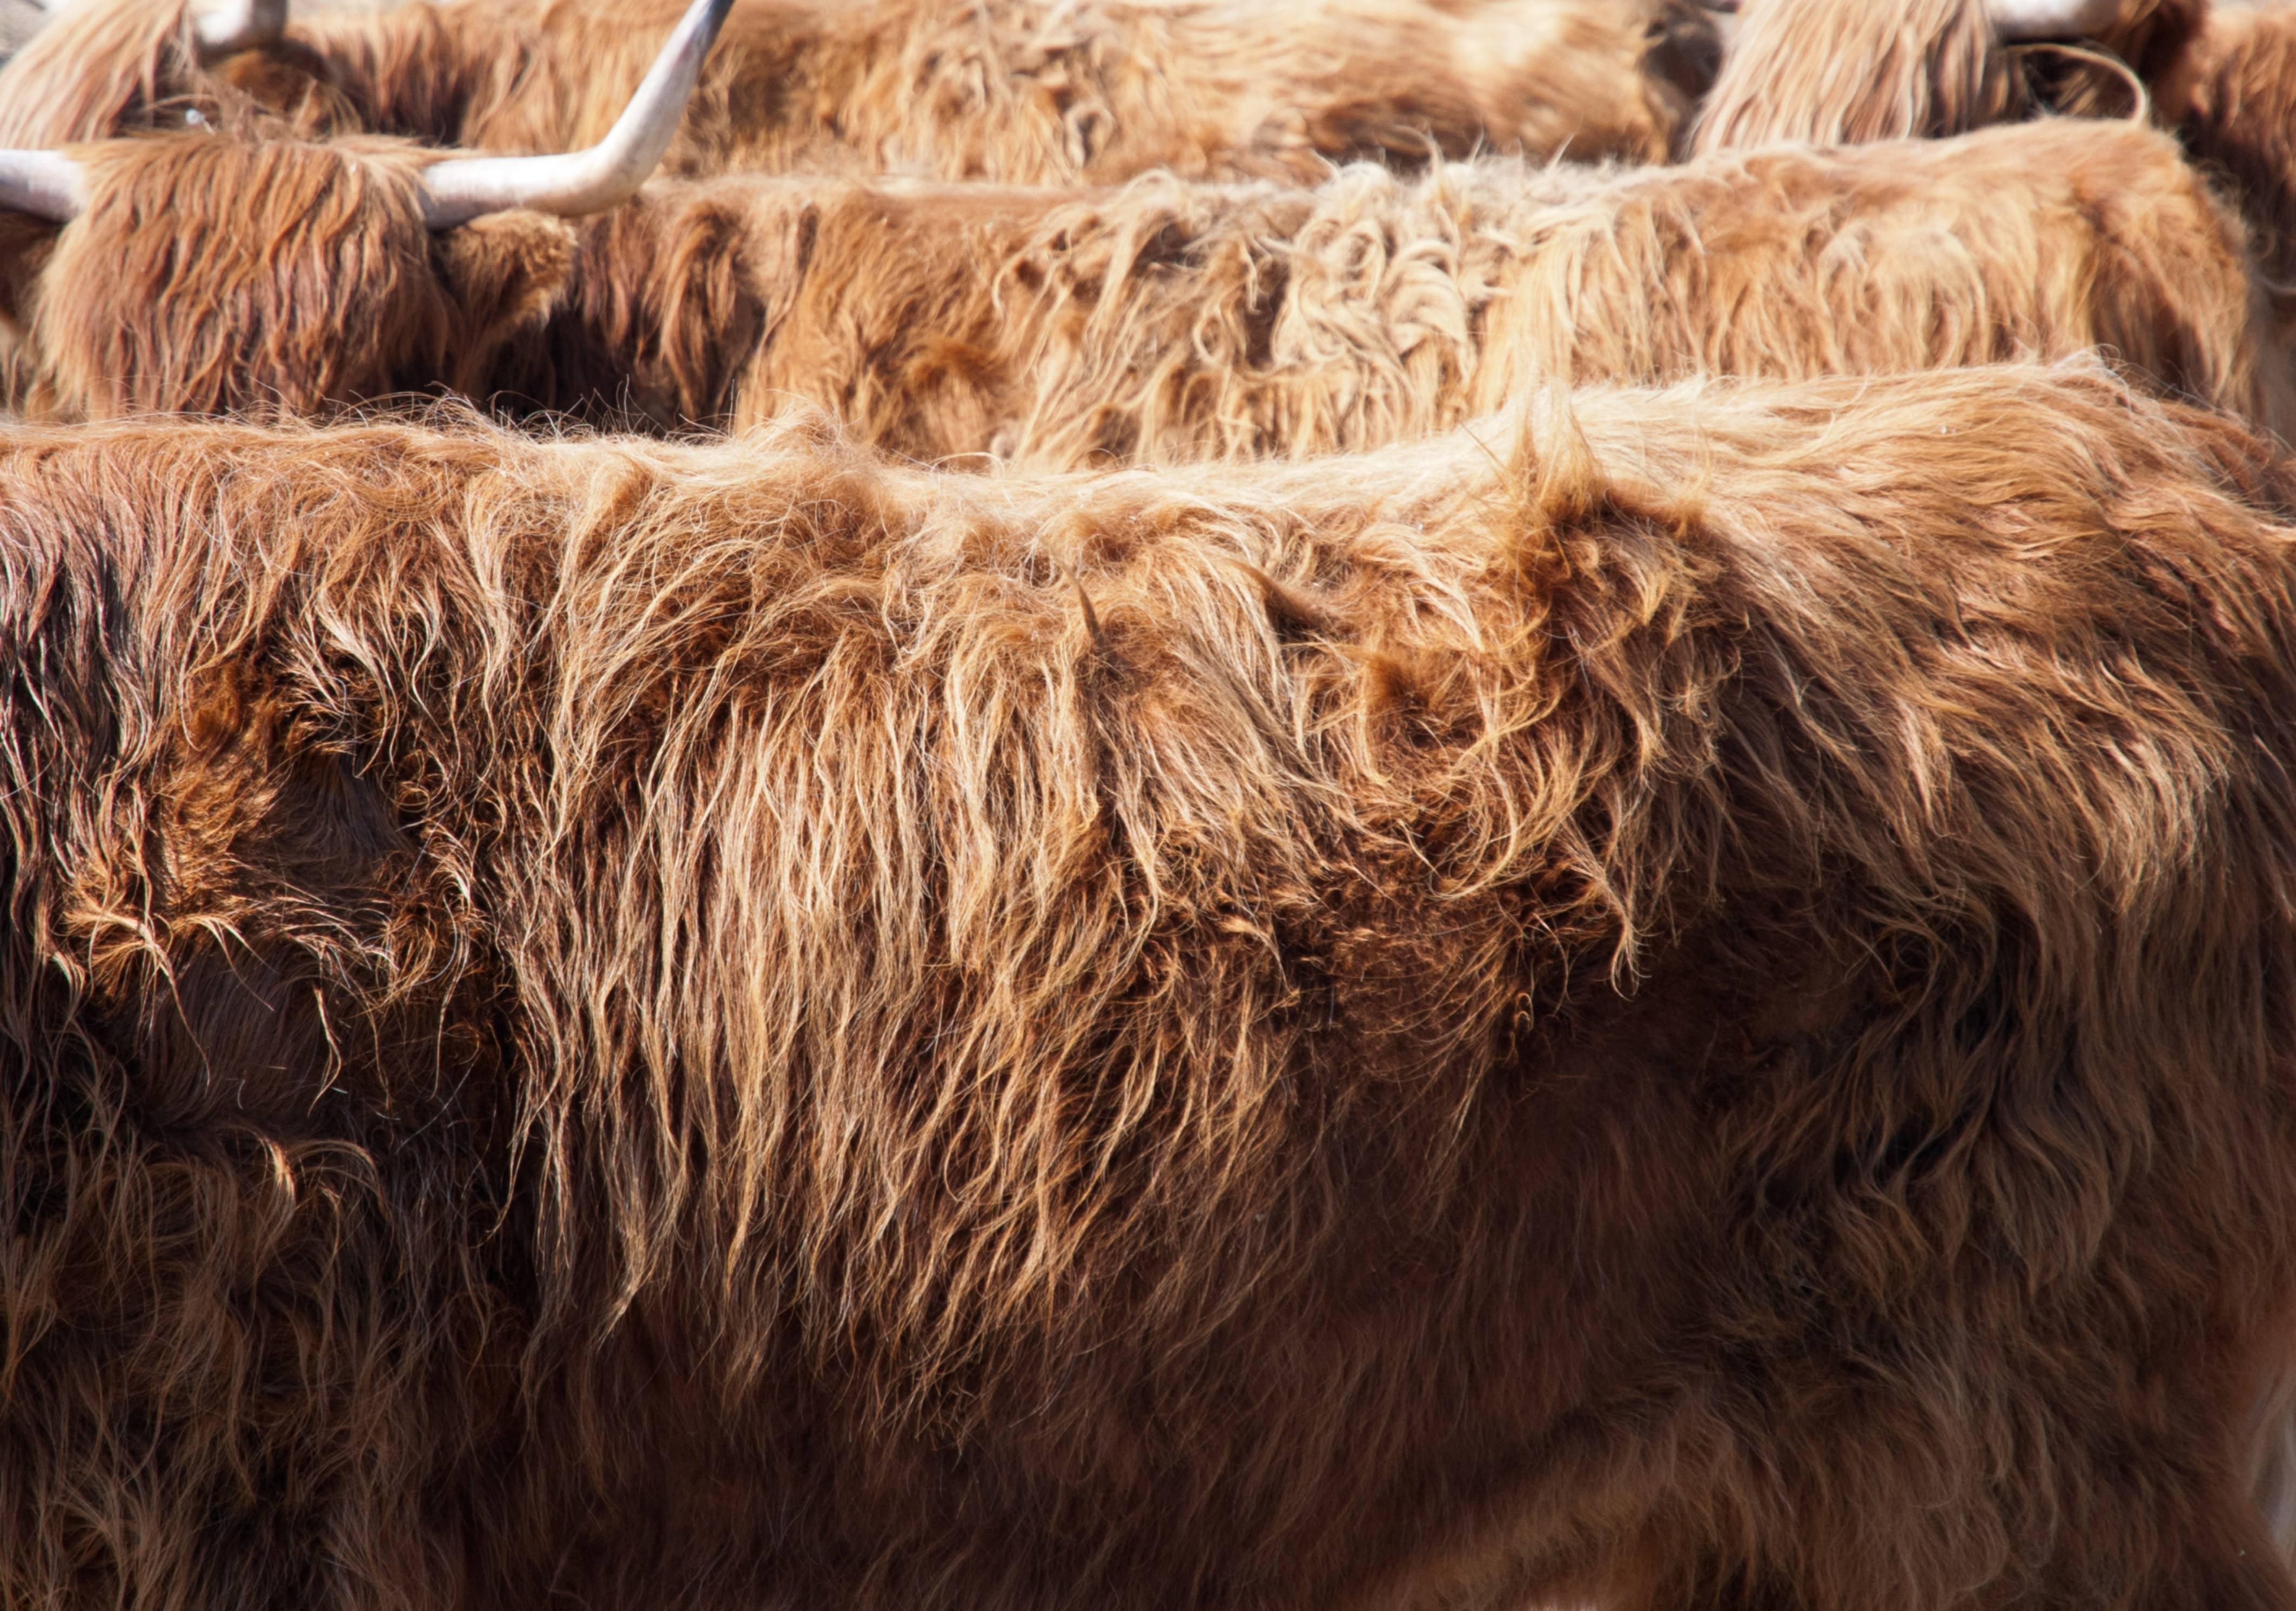 Bull Fur Pattern background